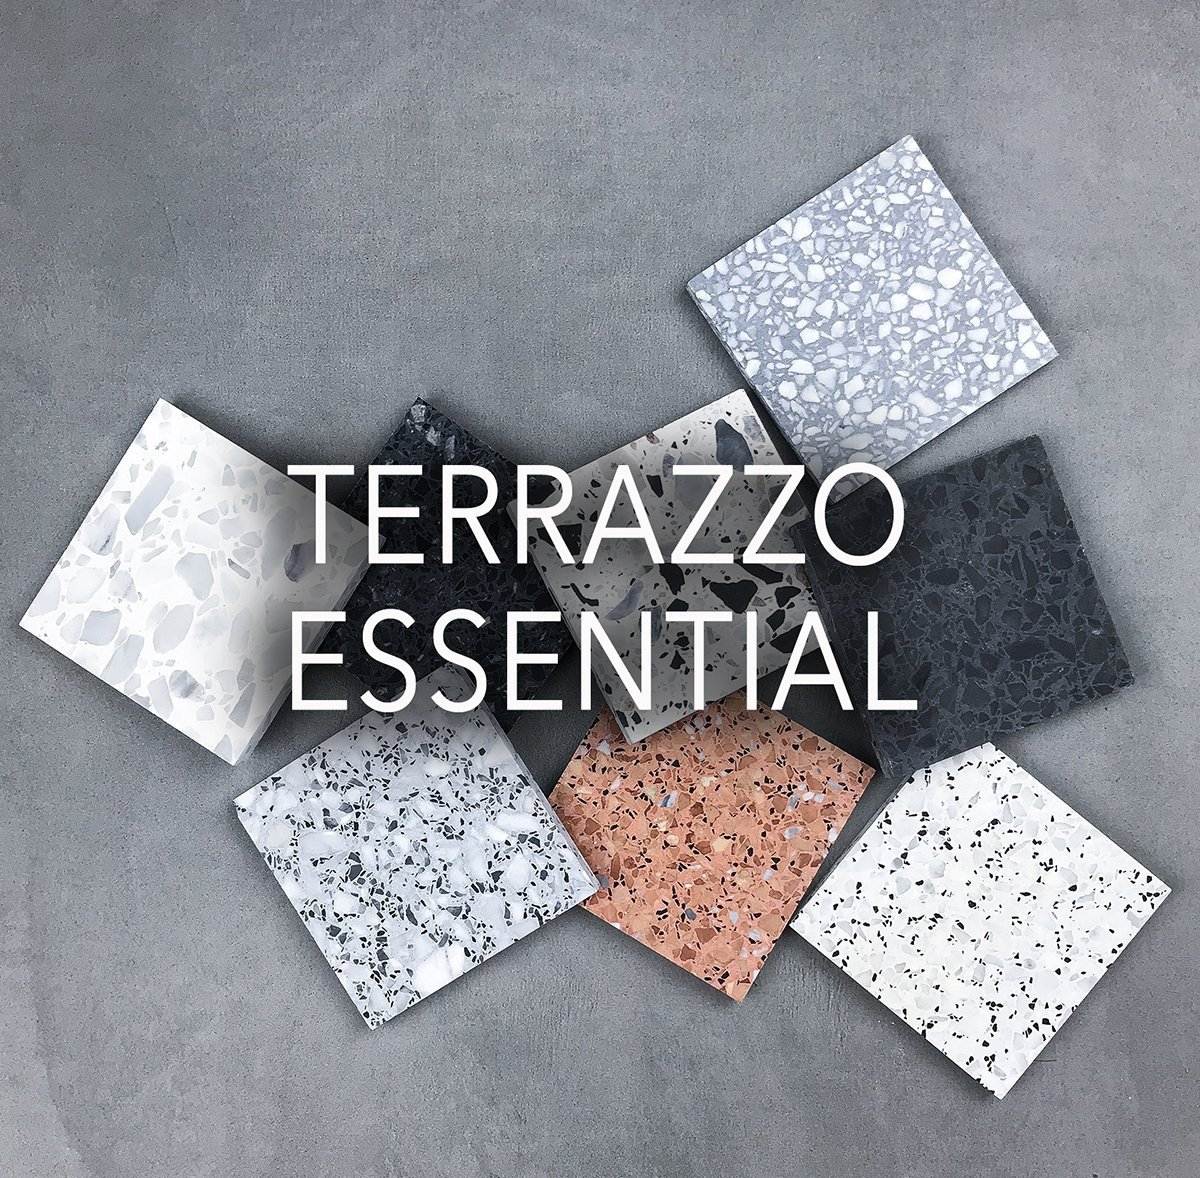 Terrazzo Essential